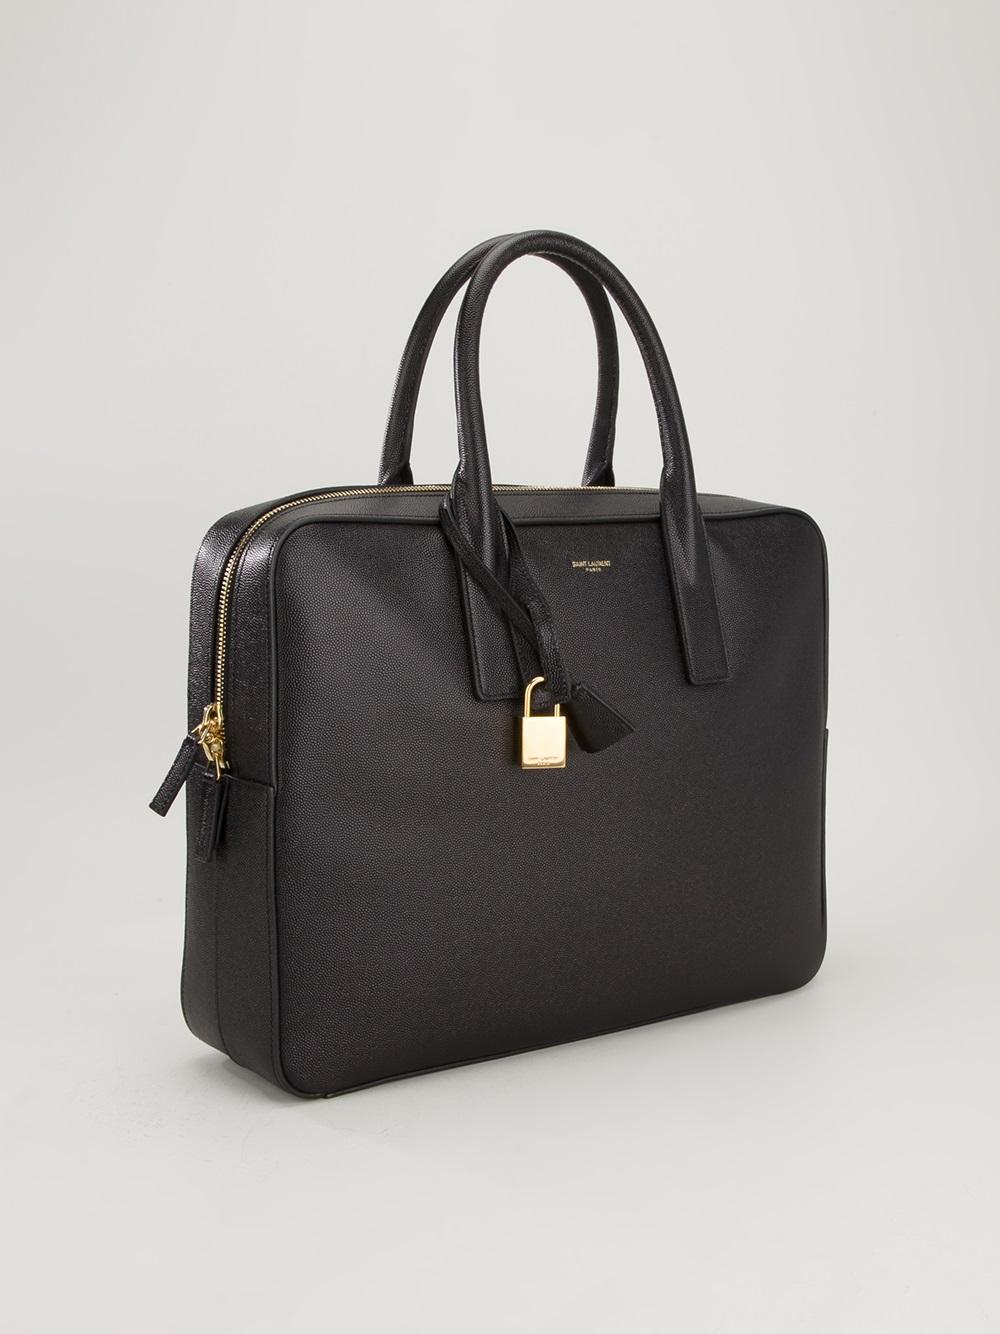 657f99df9045 Saint Laurent Tote Bag In Black Leather